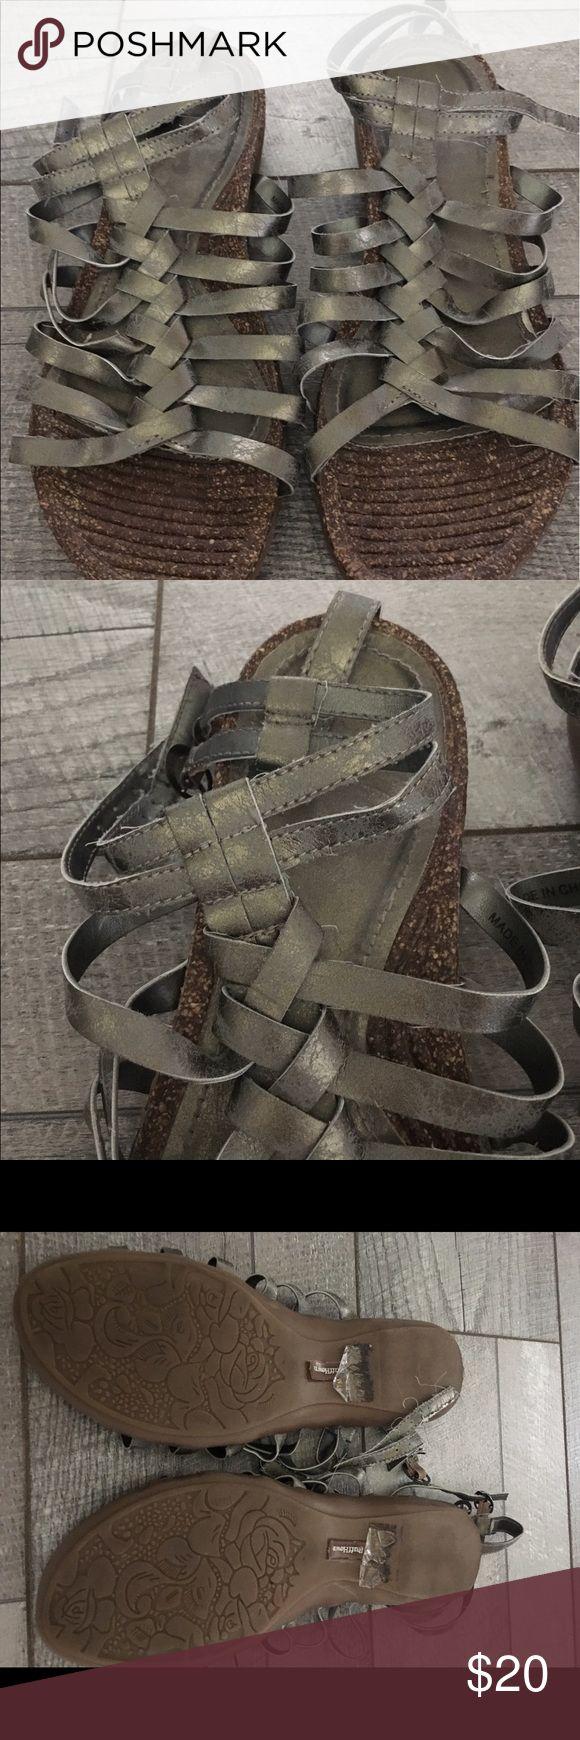 Ruff Hewn Metallic Gladiator Sandals Ruff Hewn Metallic gladiator sandals with two ankle buckles. Super cute!! Ruff Hewn Shoes Sandals